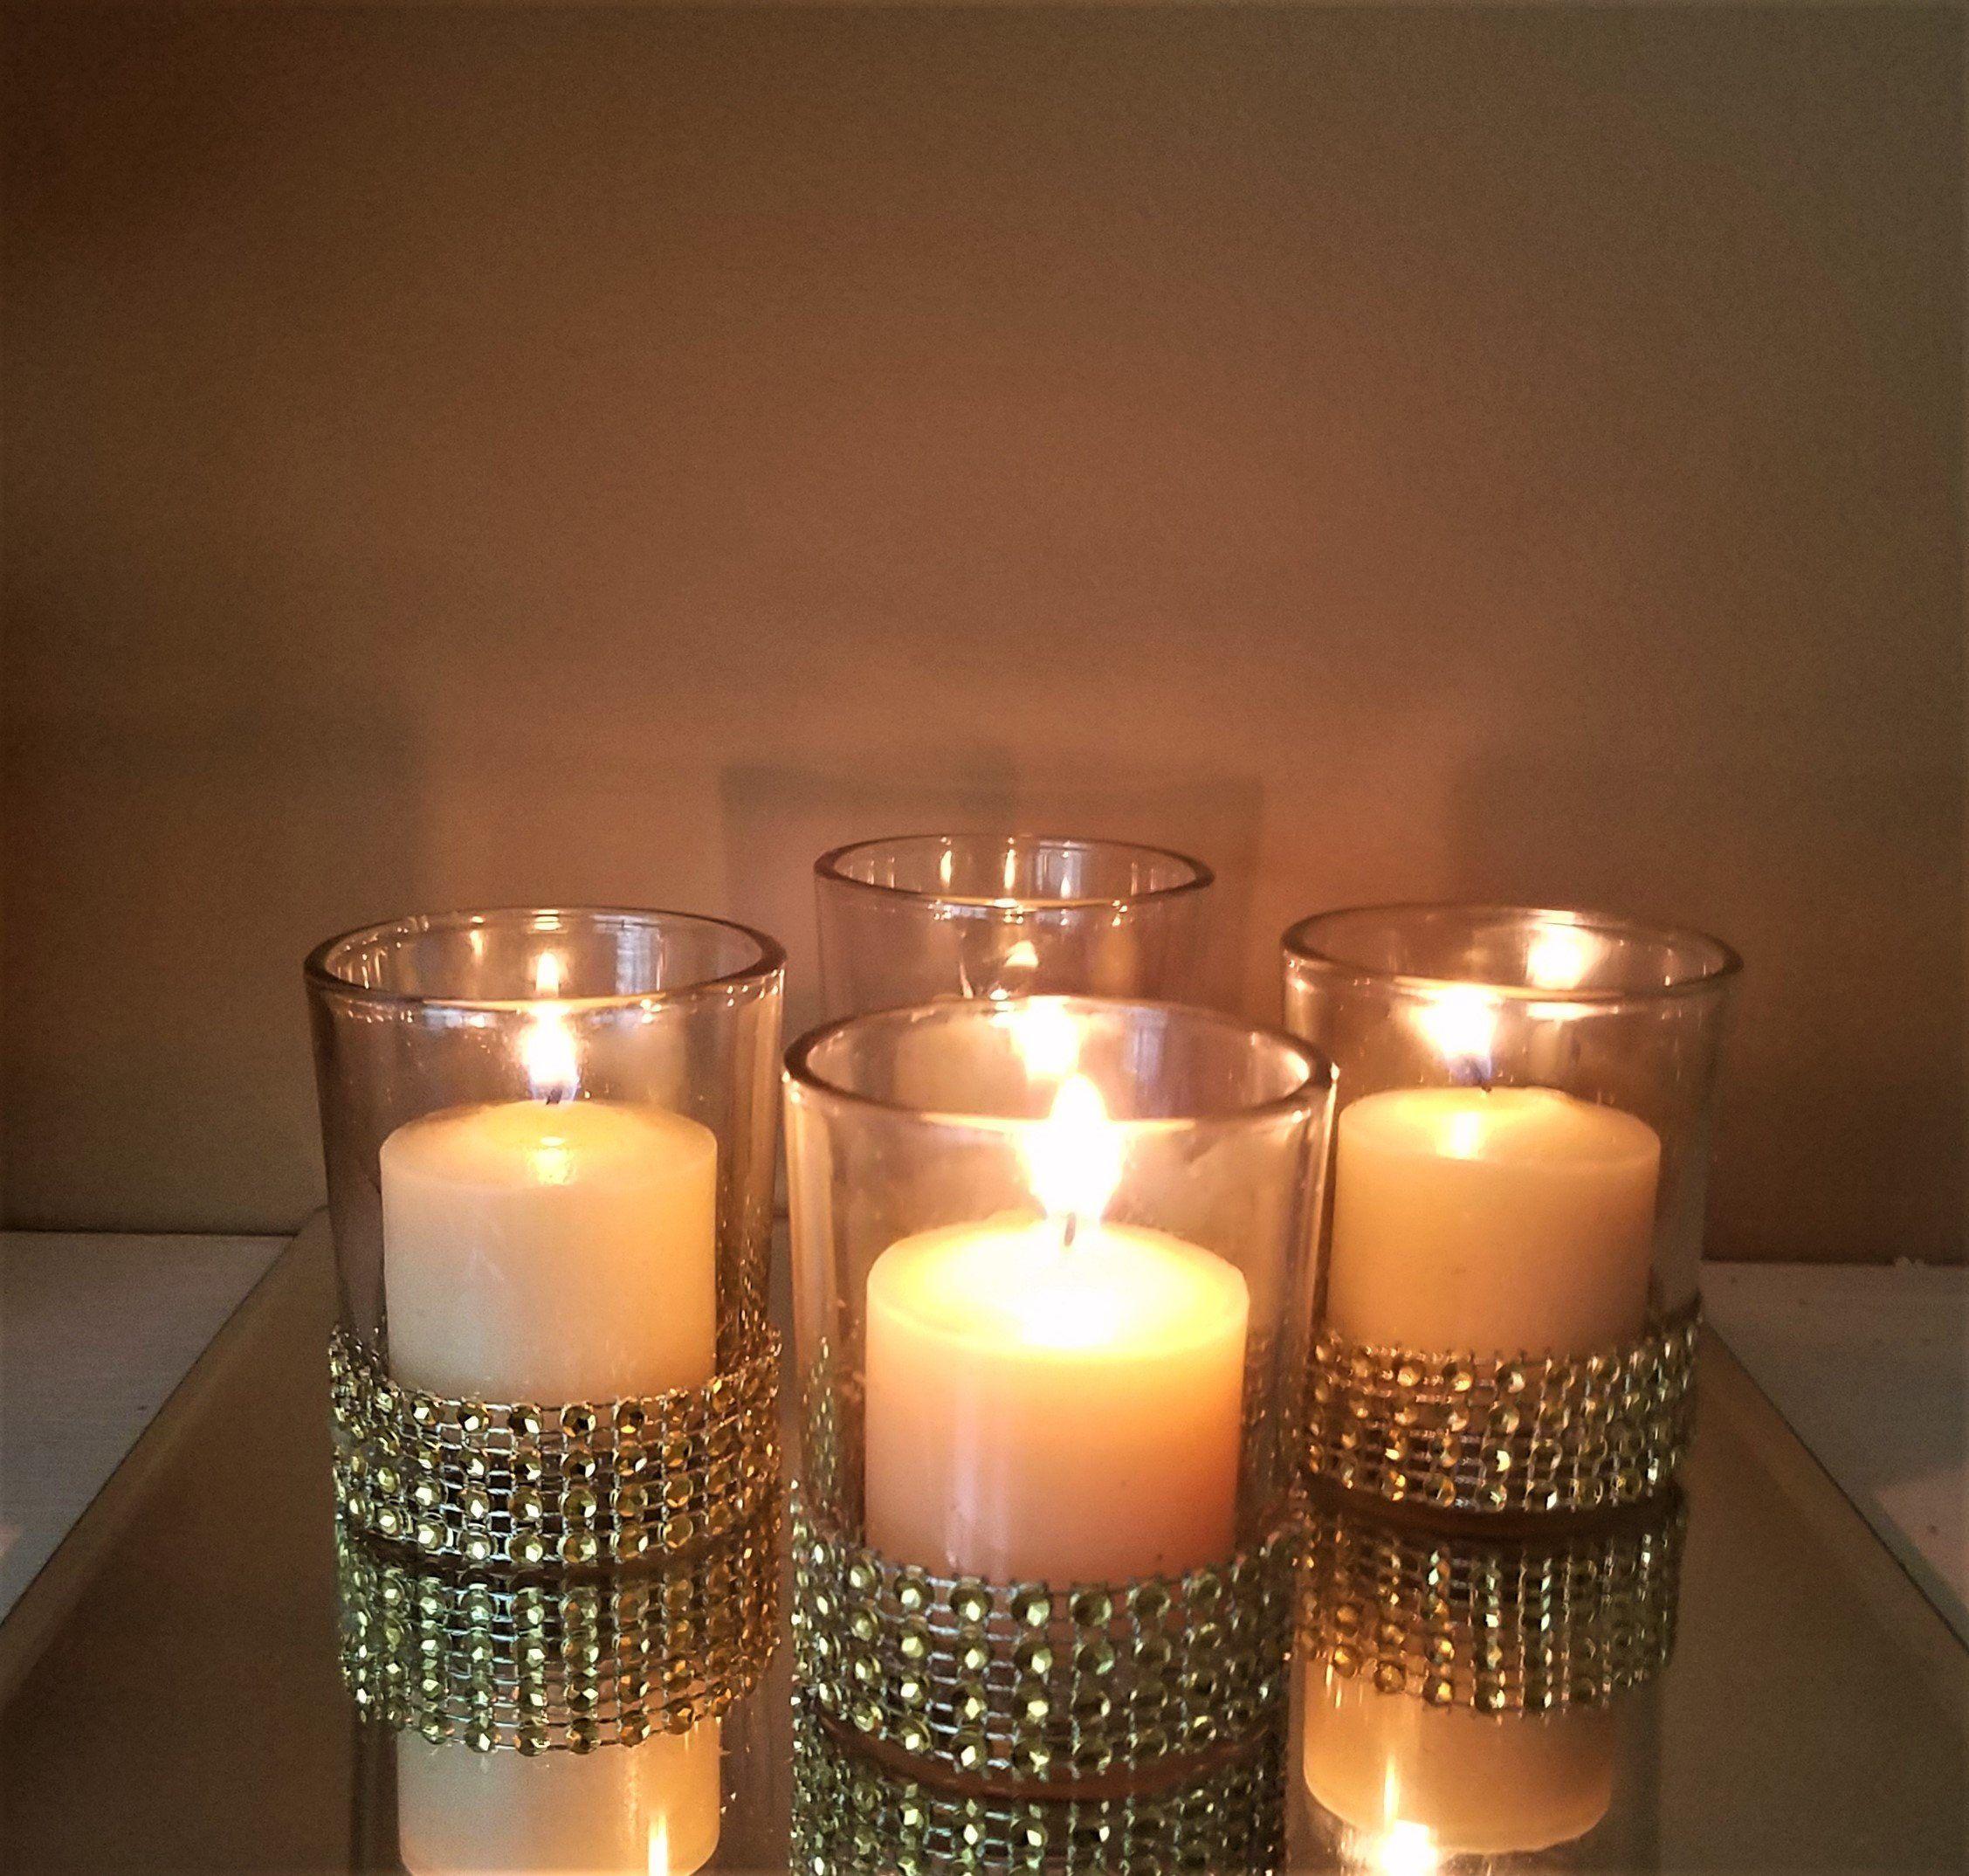 Set of 10 elegant Lace on Glass Votive Tealight Candle Holders